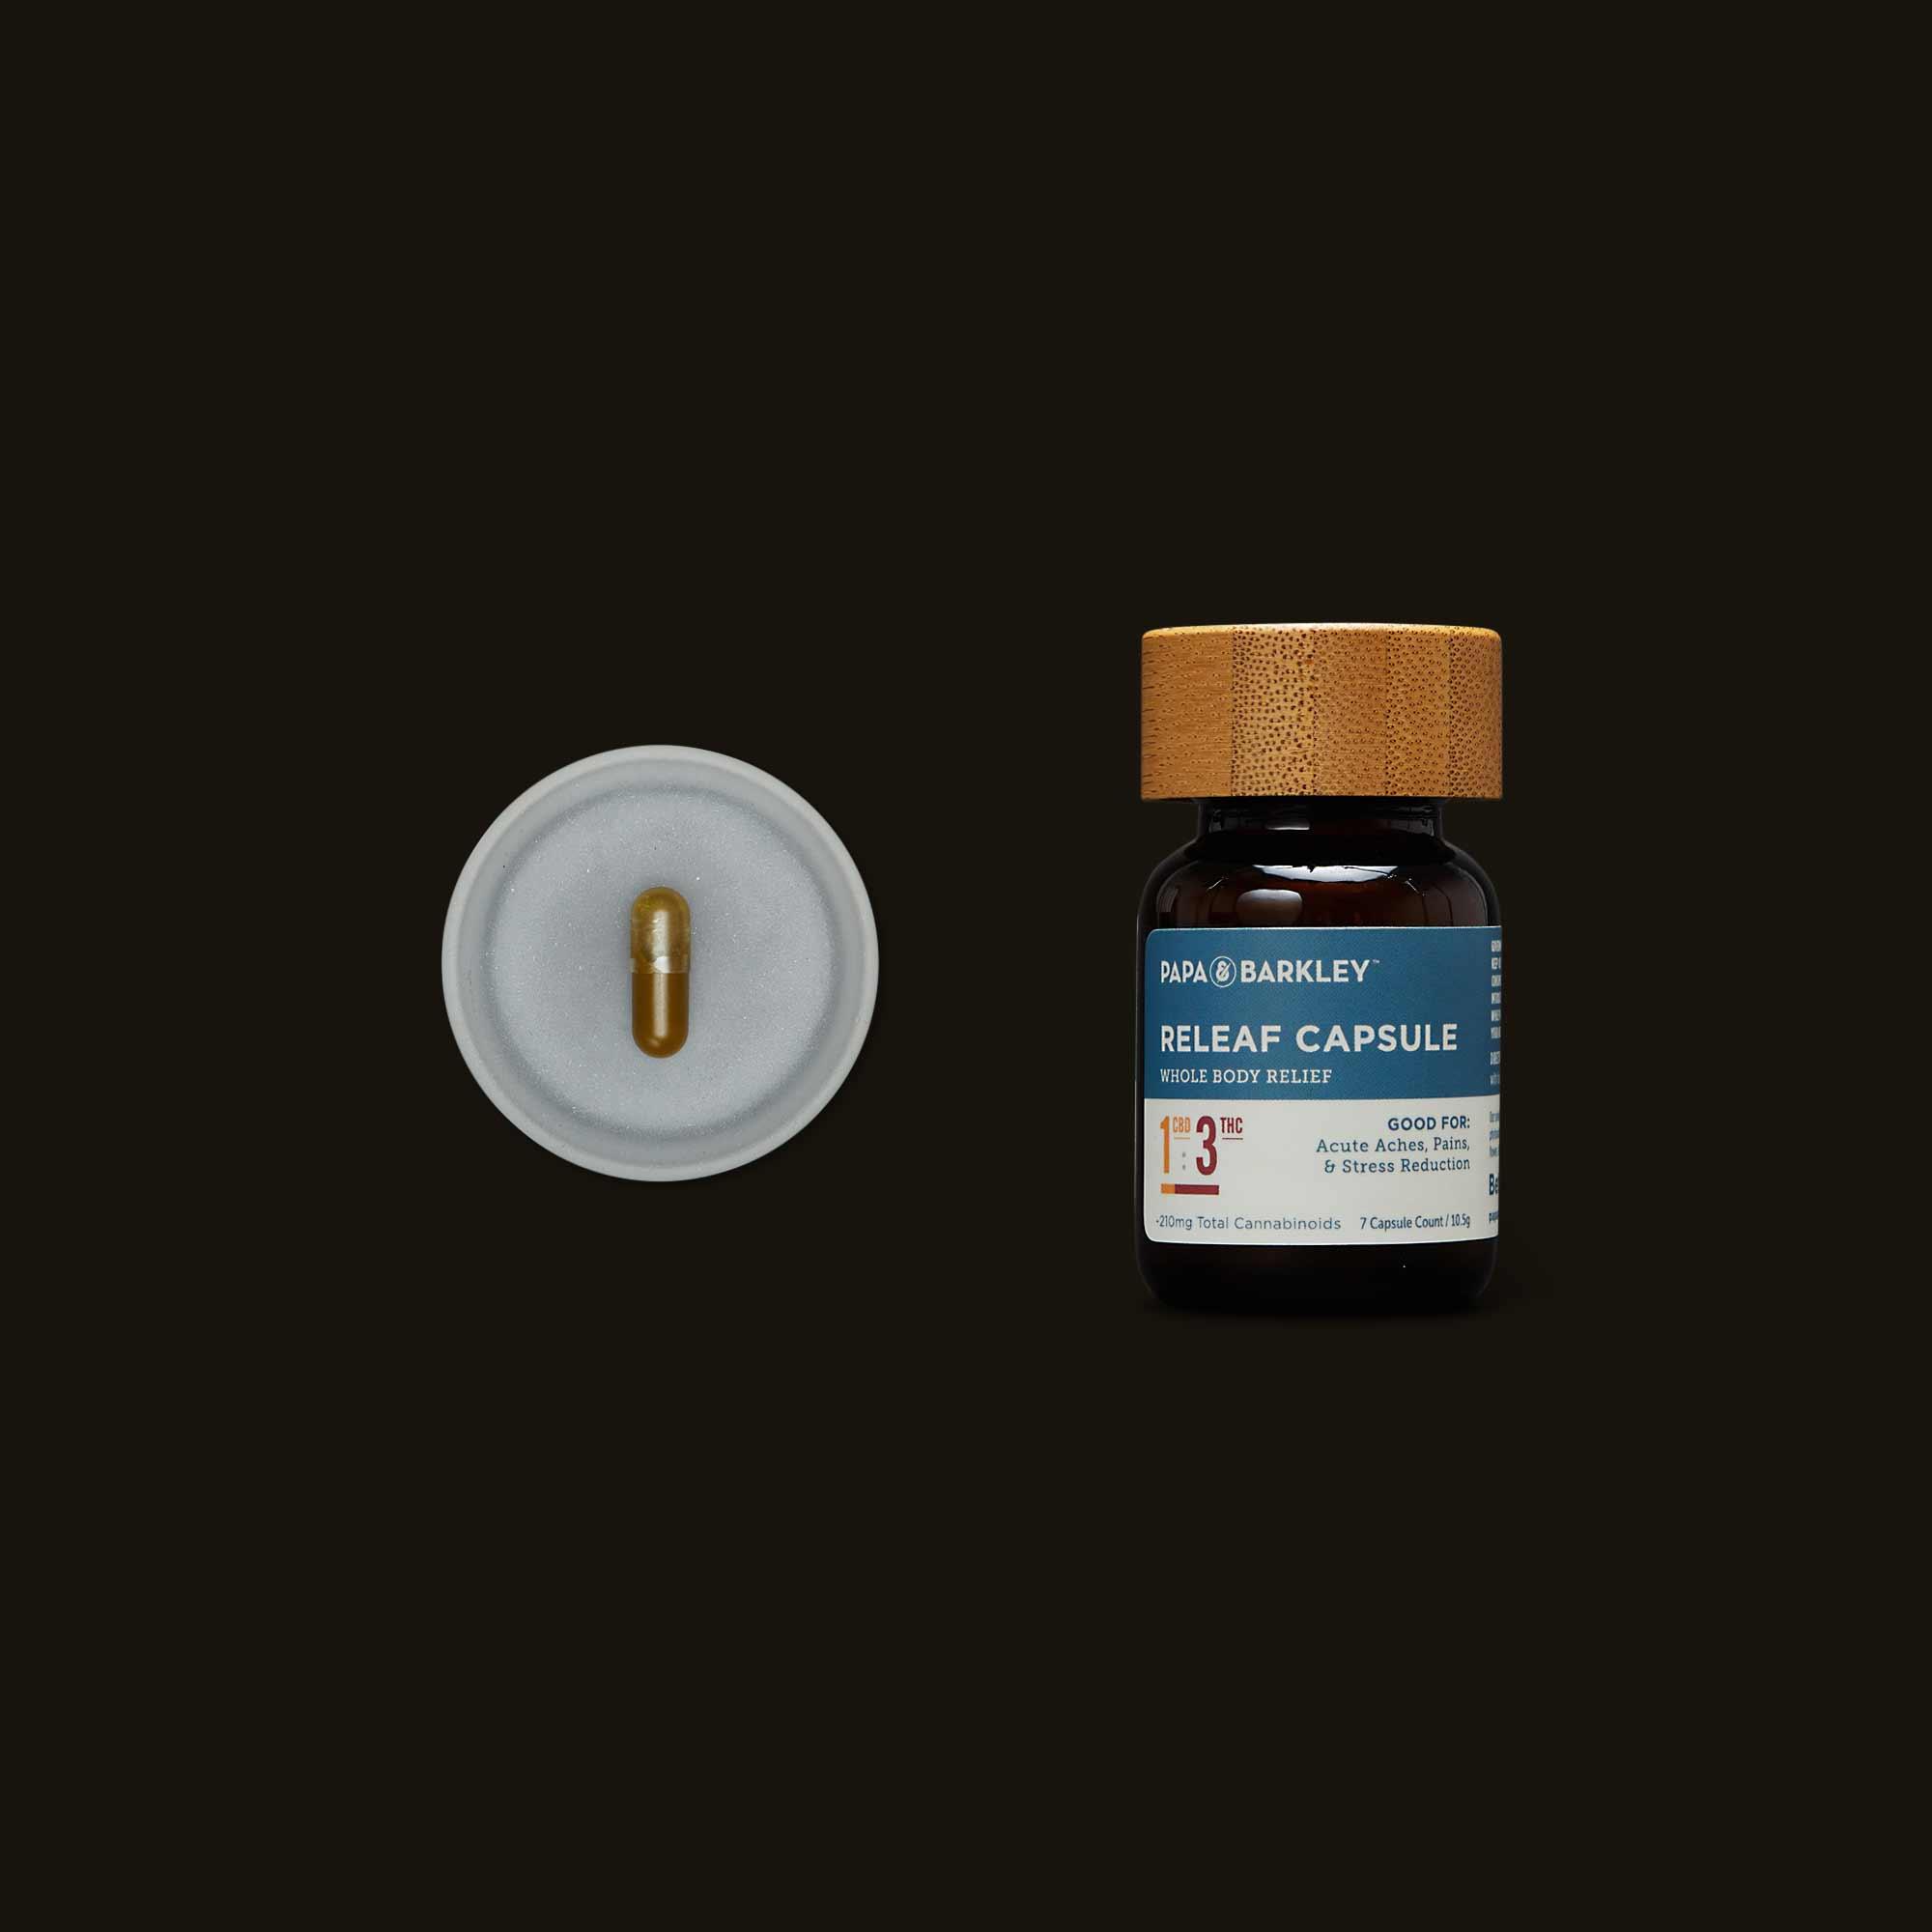 Papa & Barkley 1:3 CBD:THC Releaf Capsule